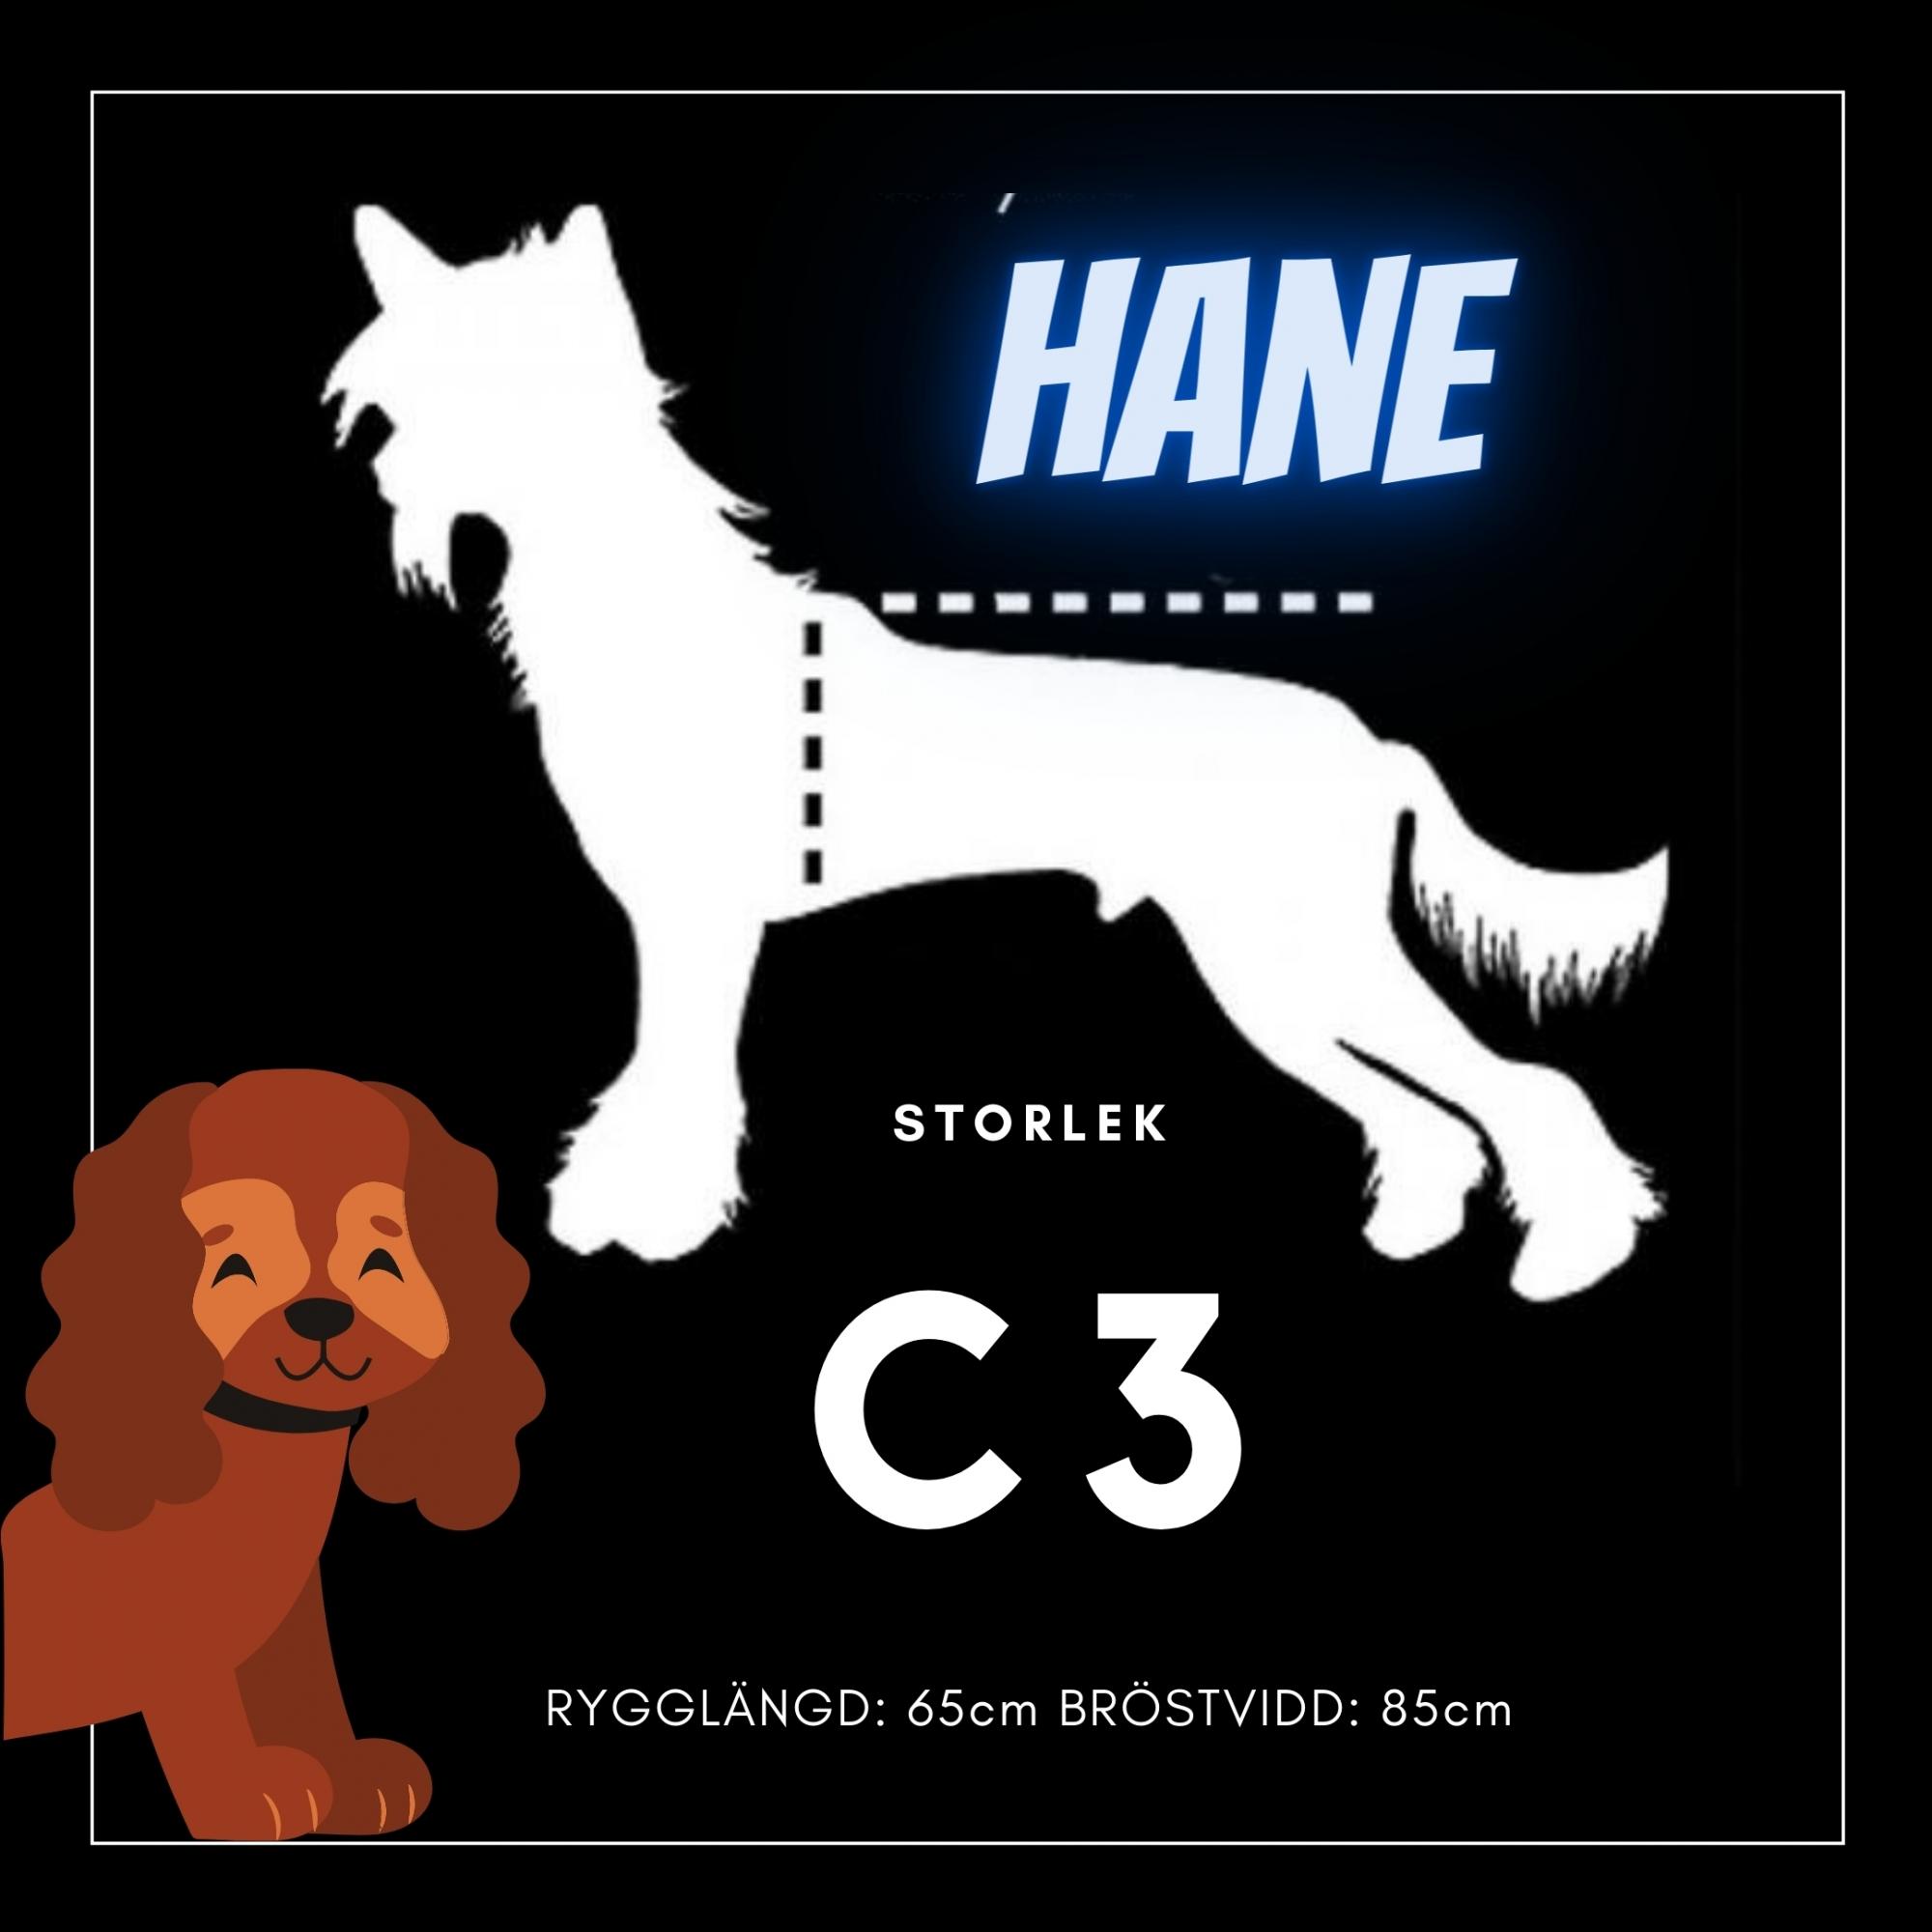 Hane Storlek C3 - Passion For Pet Fashion